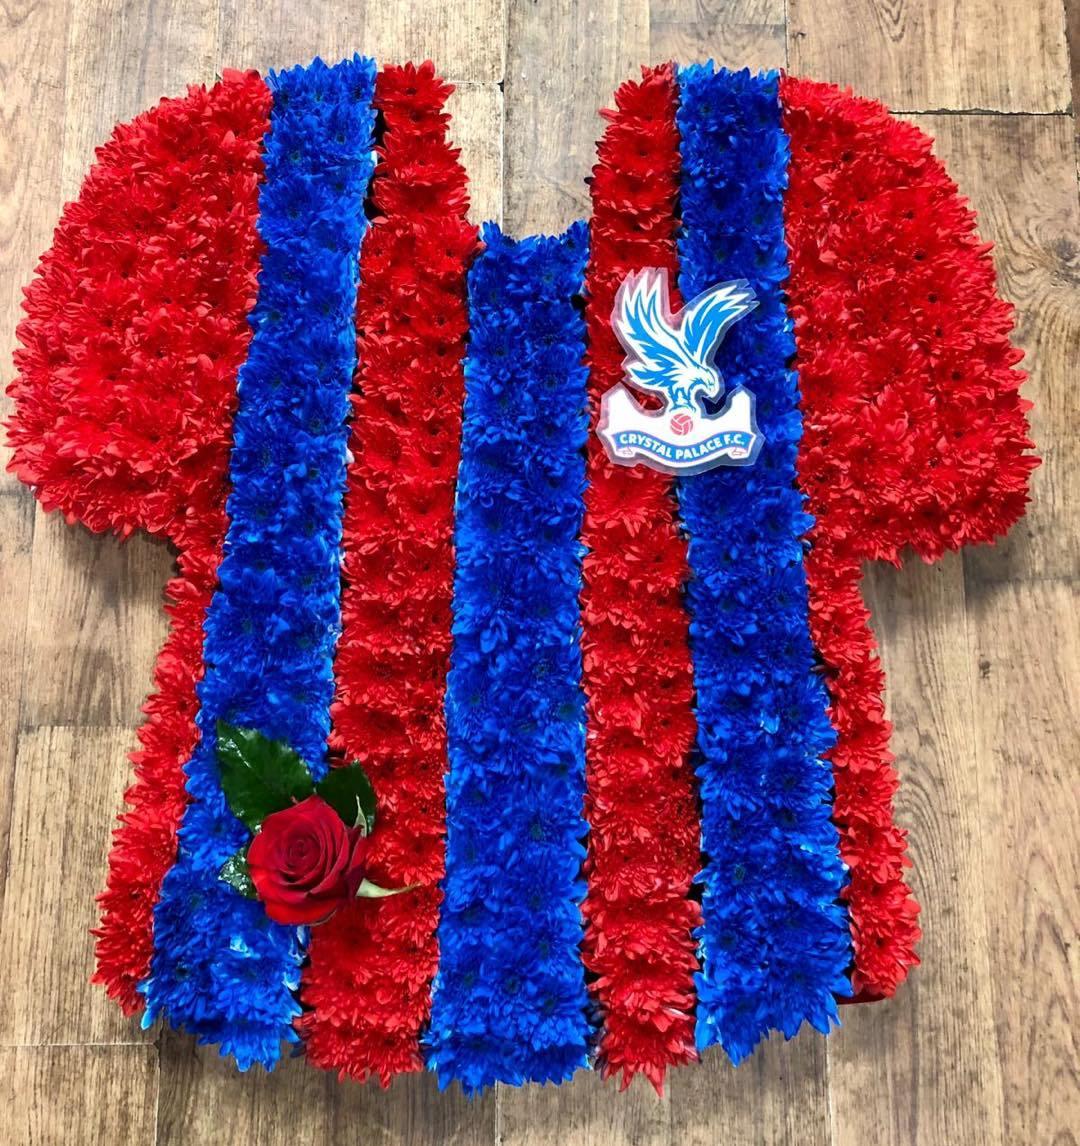 Crystal Palace FC Home Shirt £120.00